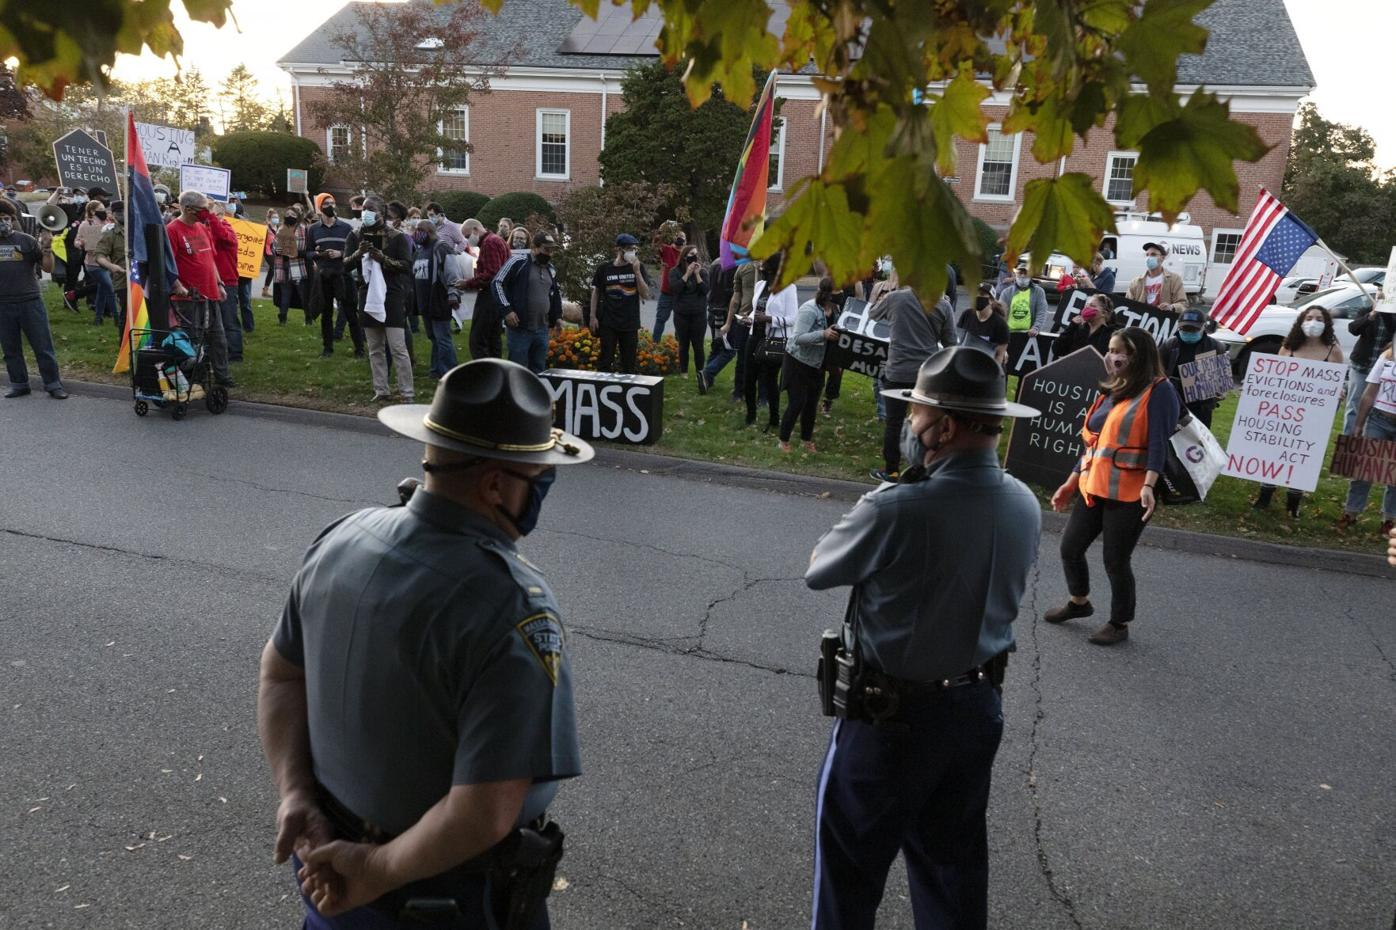 Virus Outbreak Evictions Massachusetts